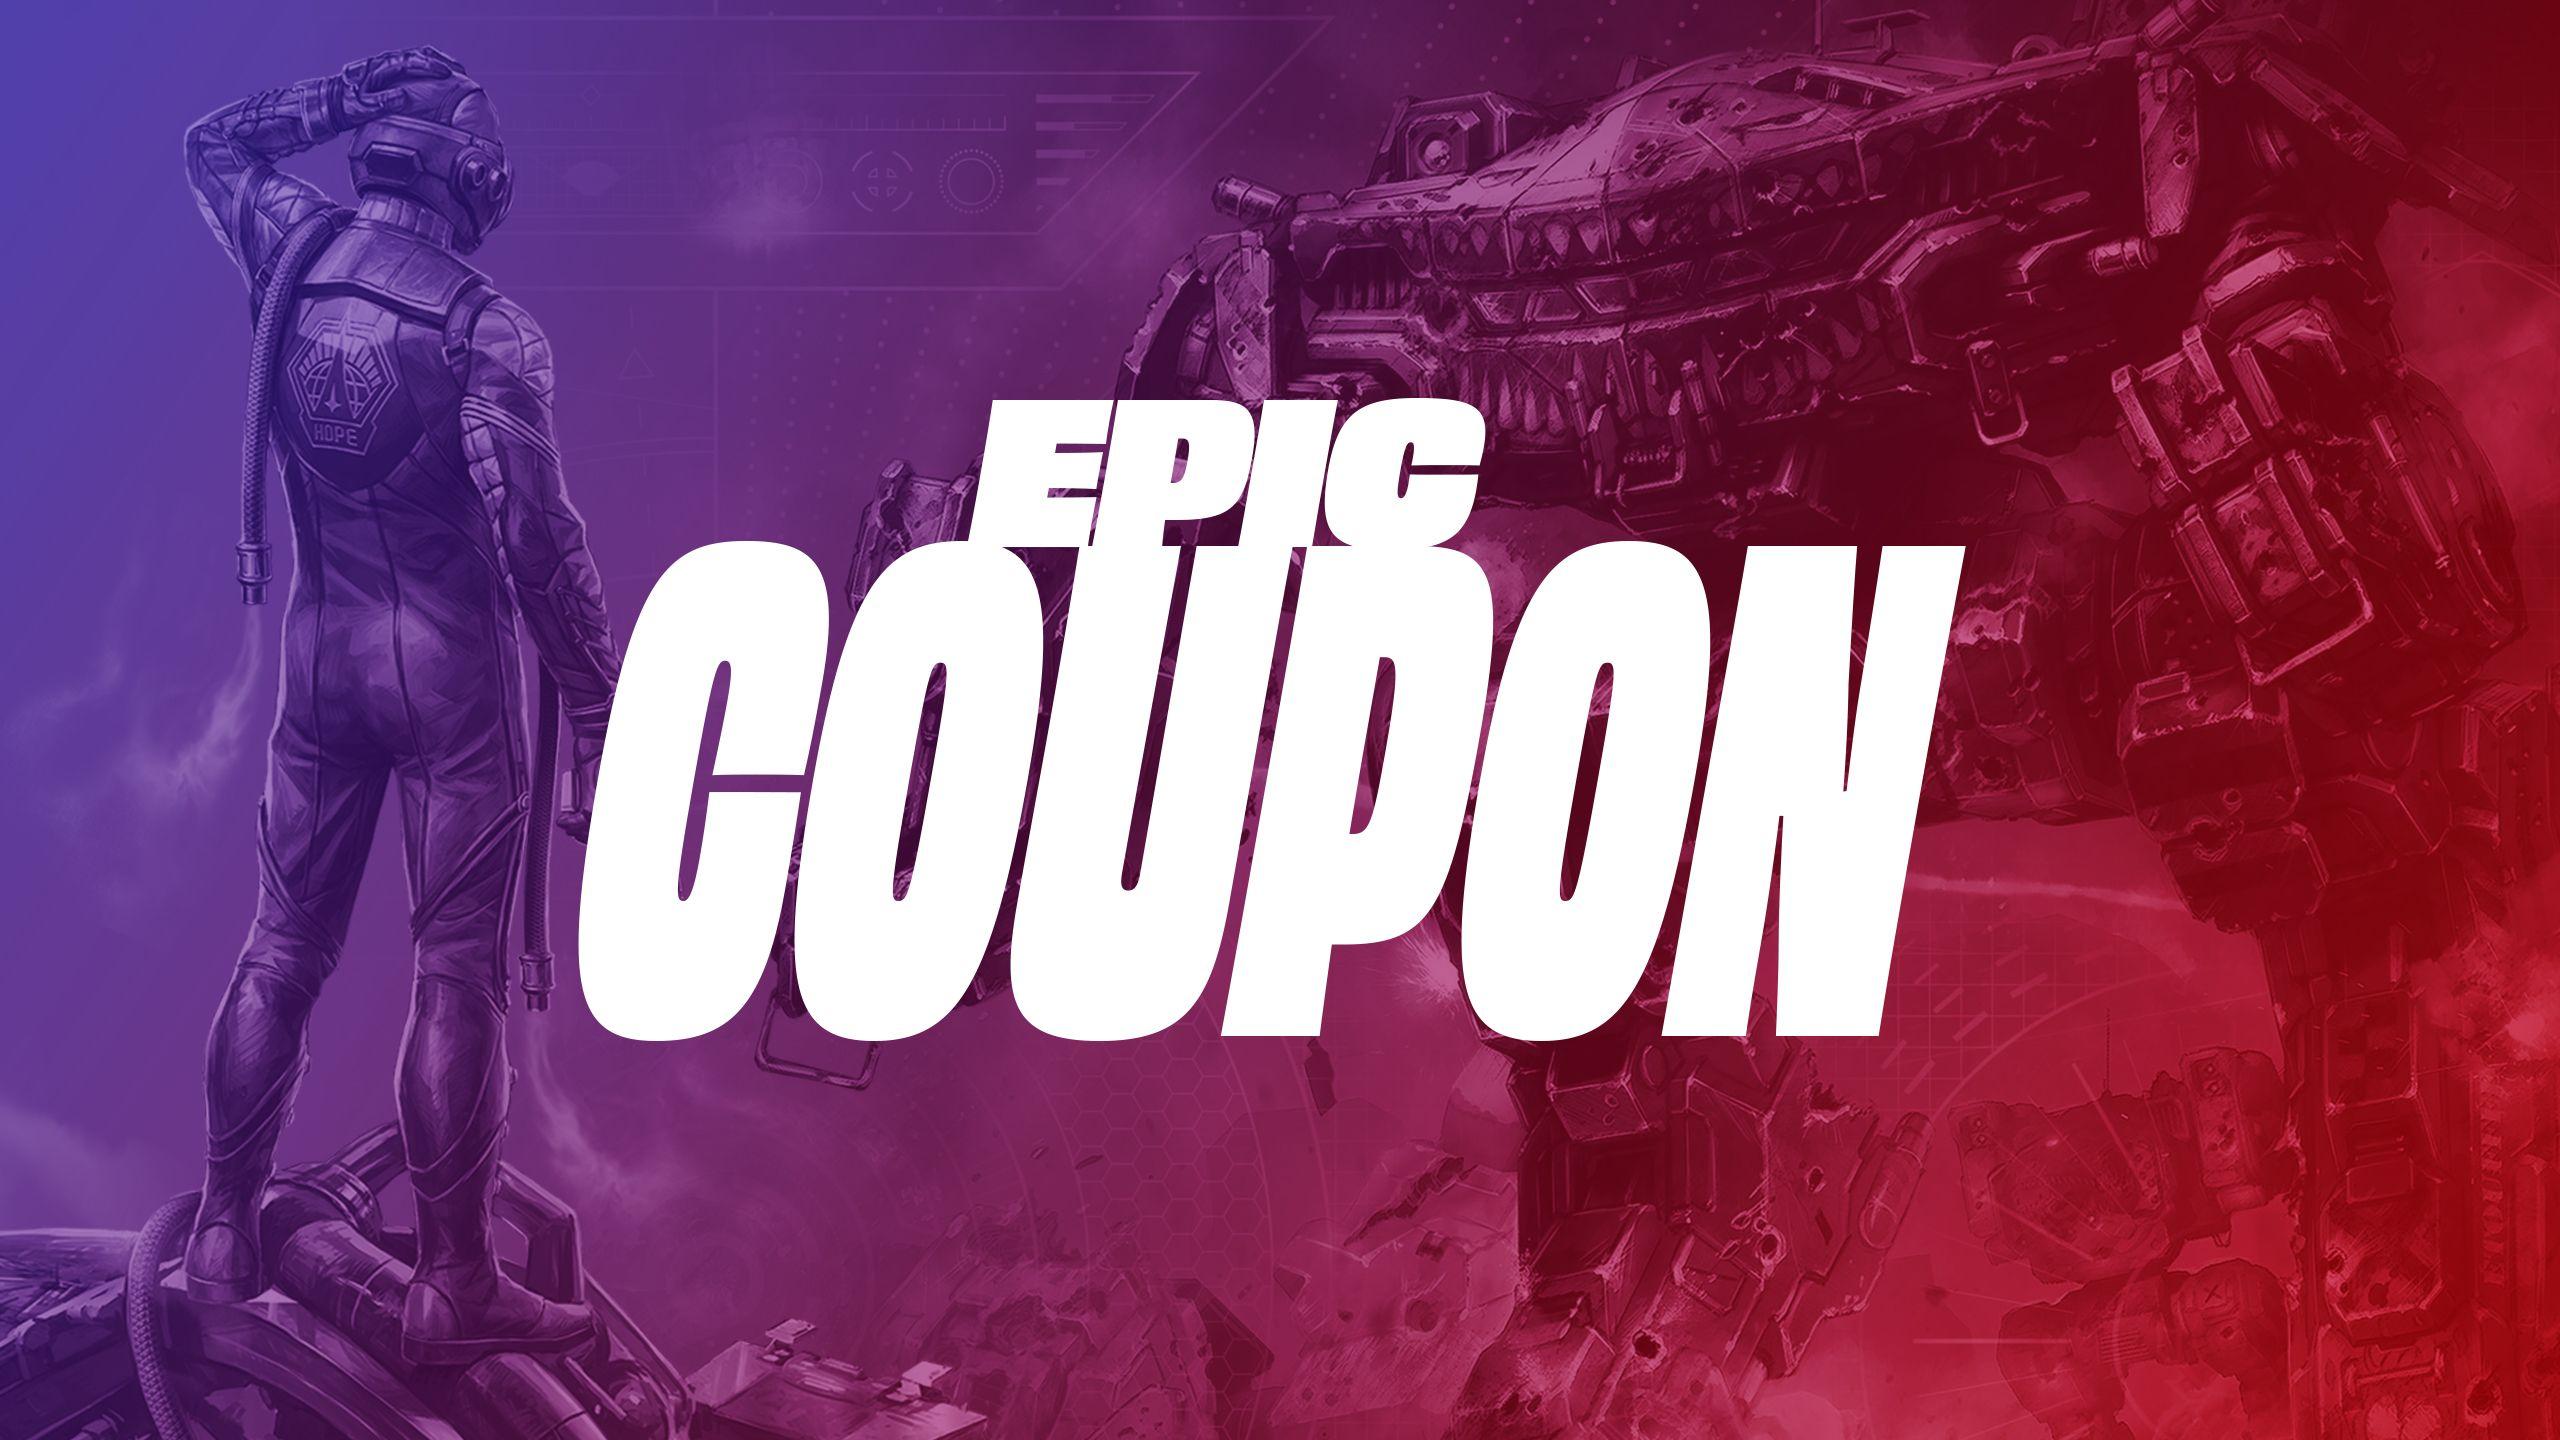 GTA 5 Premium Edition @Epic kupon